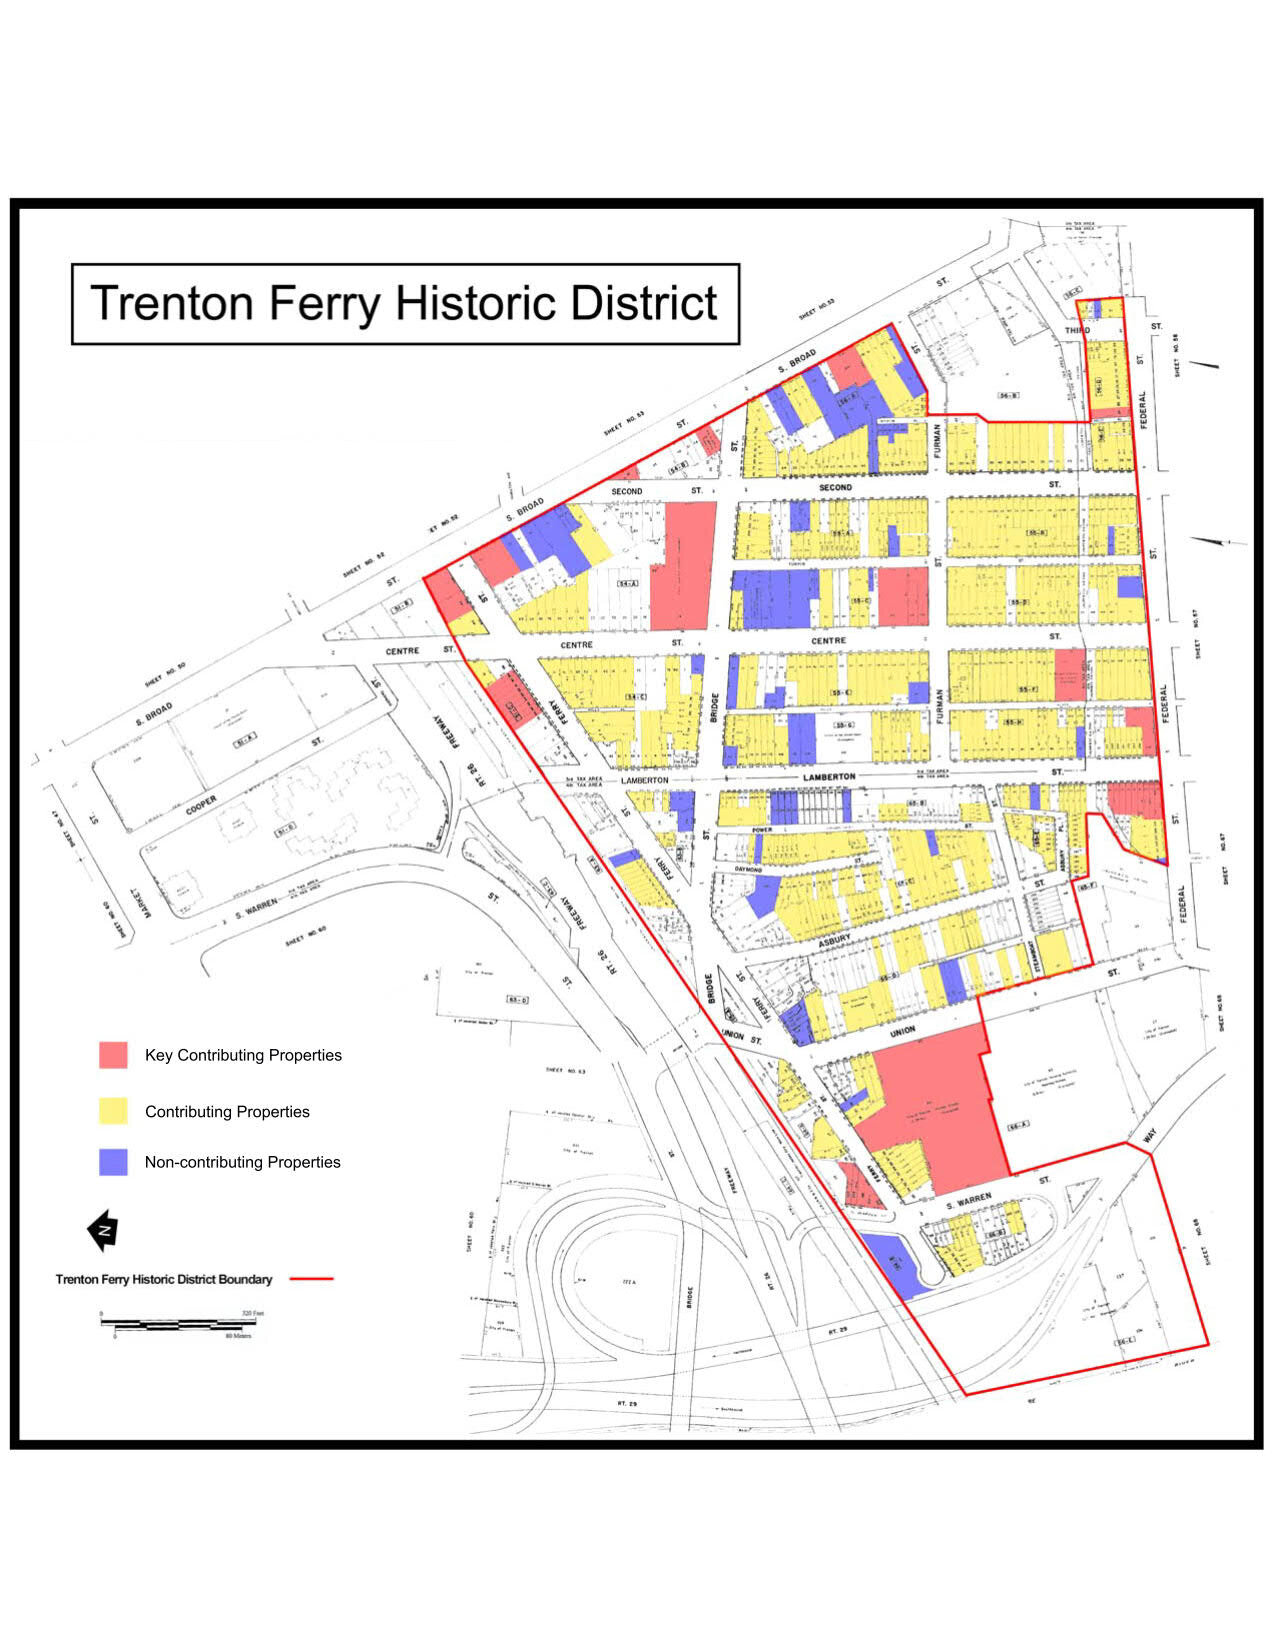 12018 Trenton Ferry HD Nomination_Key Map to Contributing Properties_1.jpg